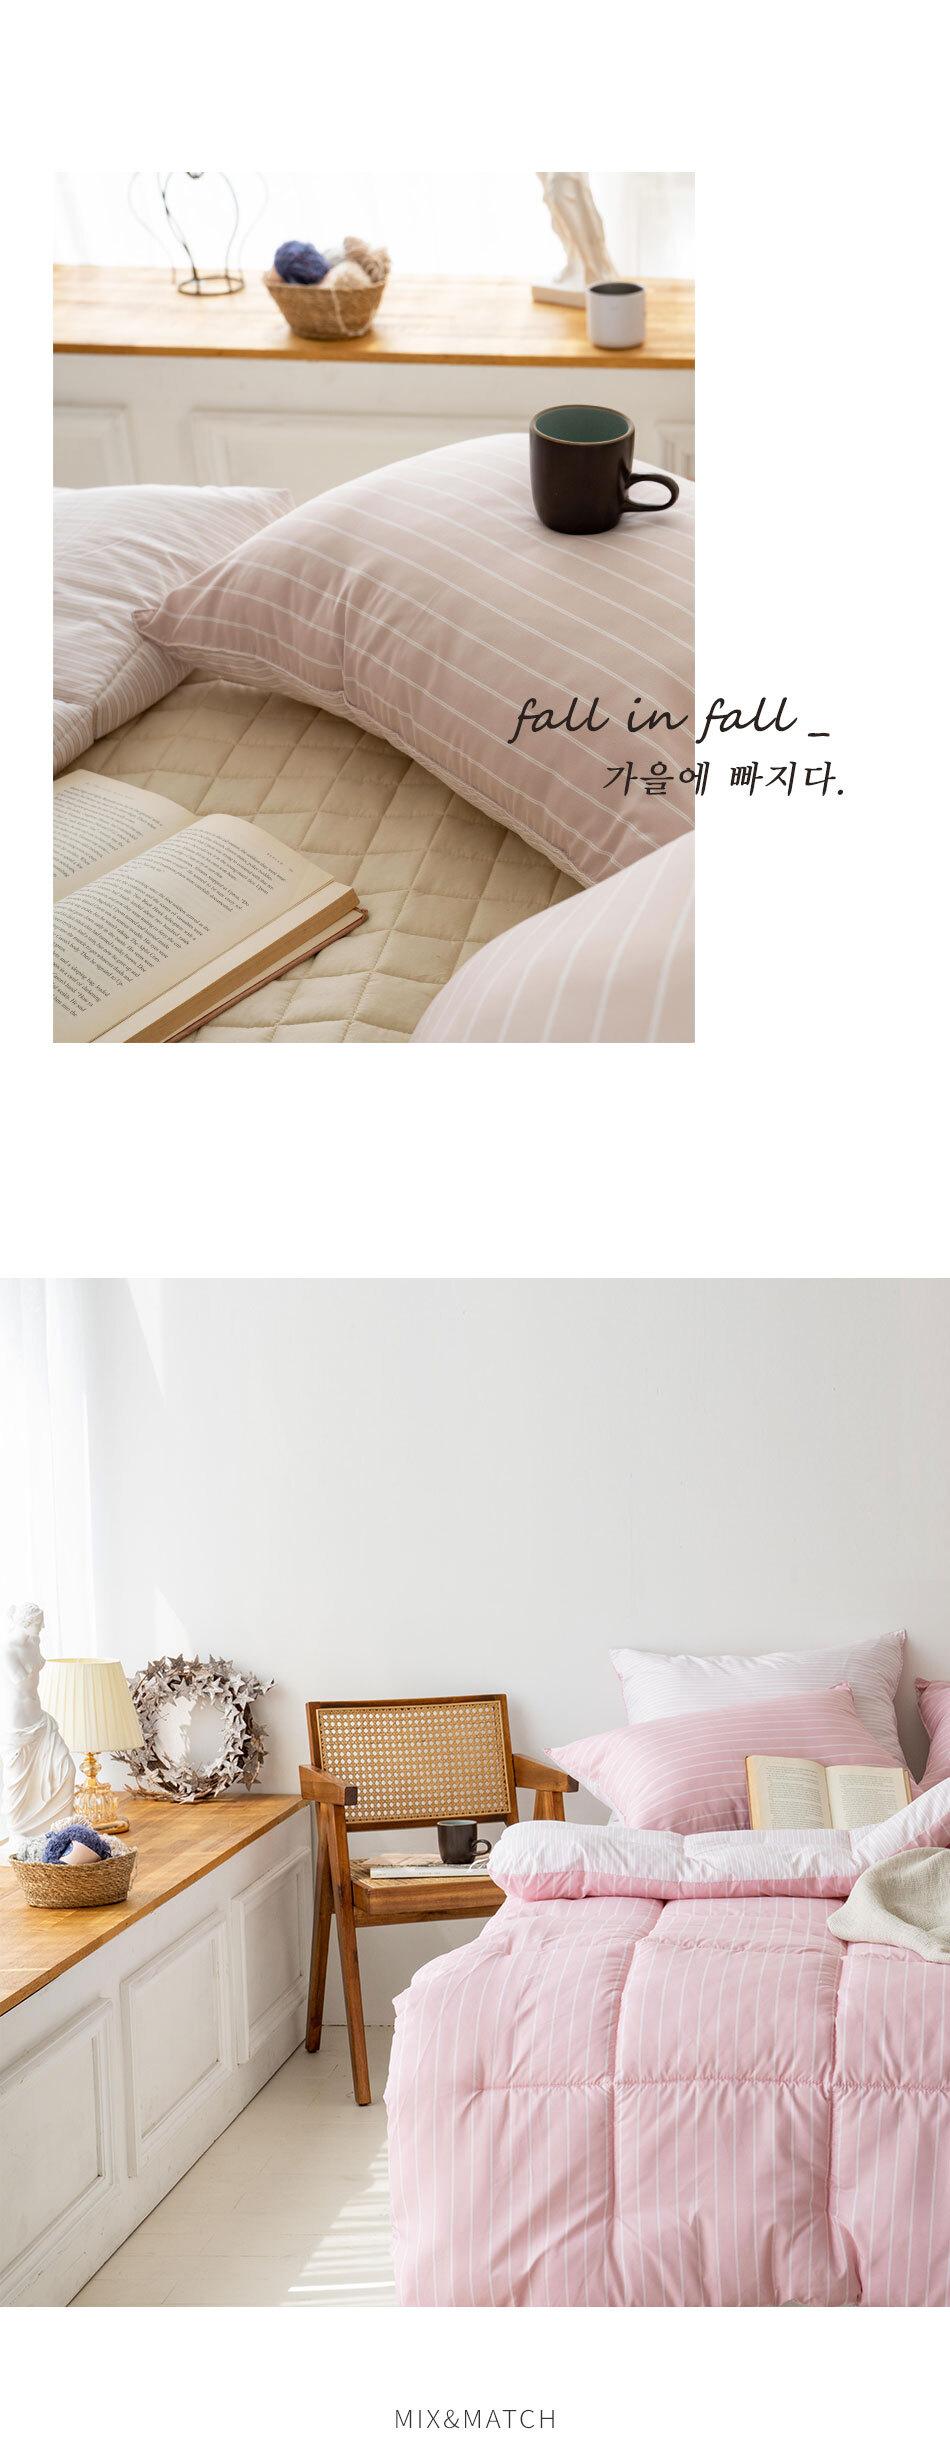 urban_bed_top_01.jpg